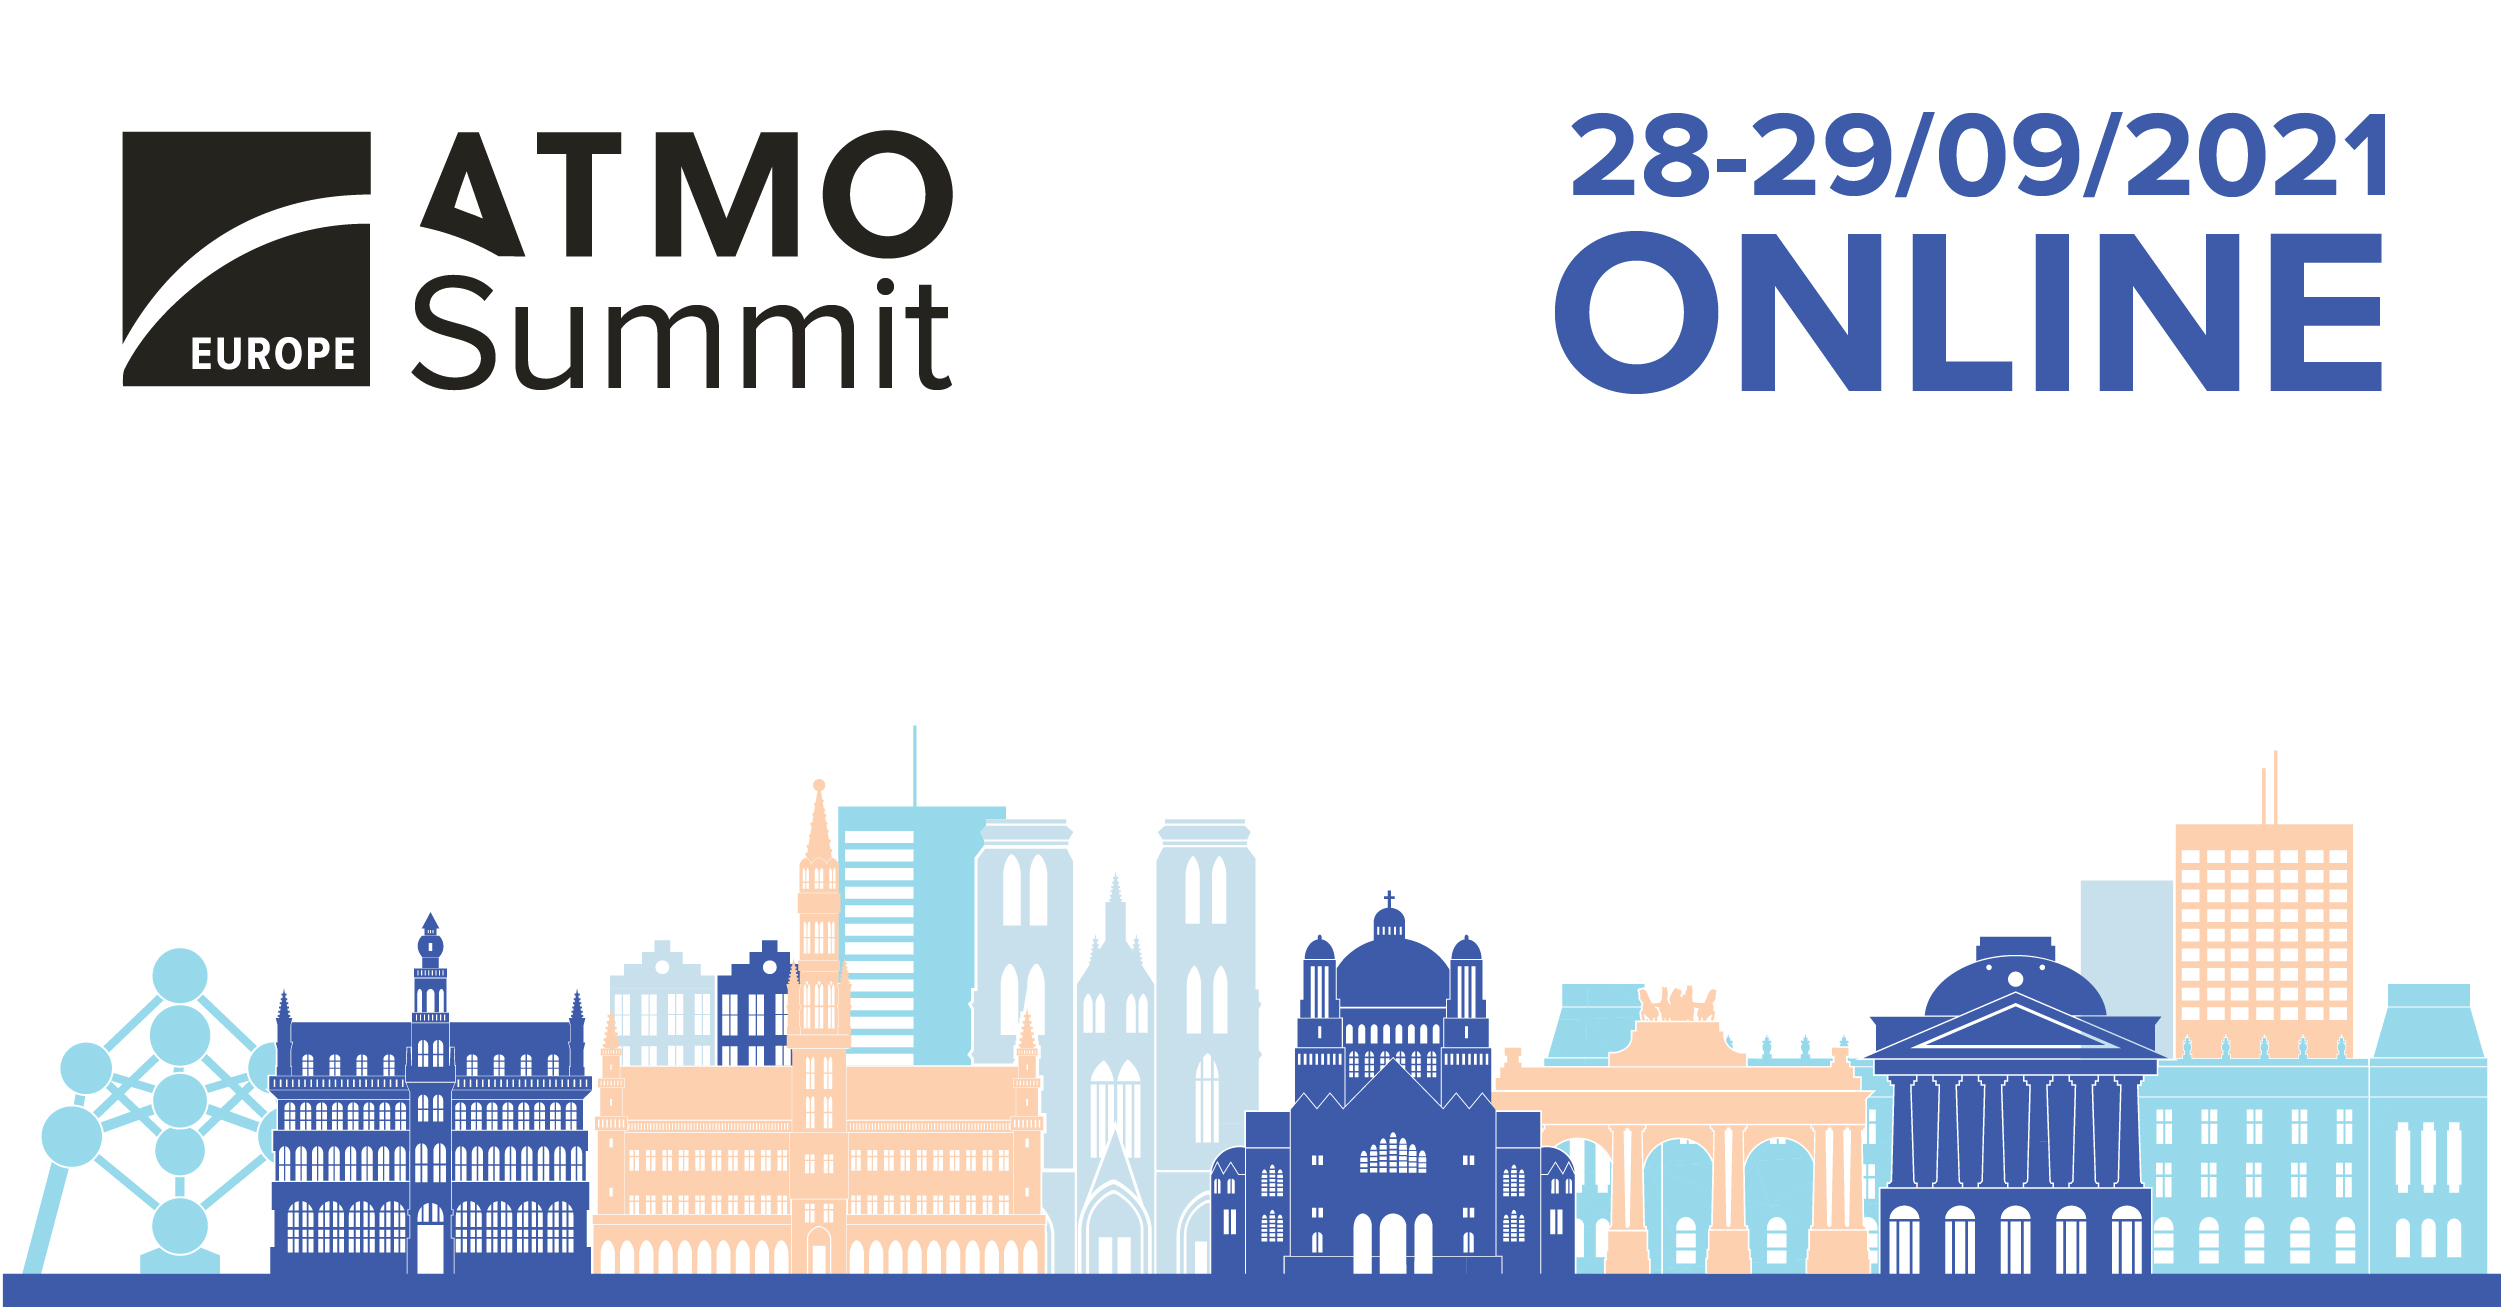 ATMO Europe summit 2021 - New speakers announced